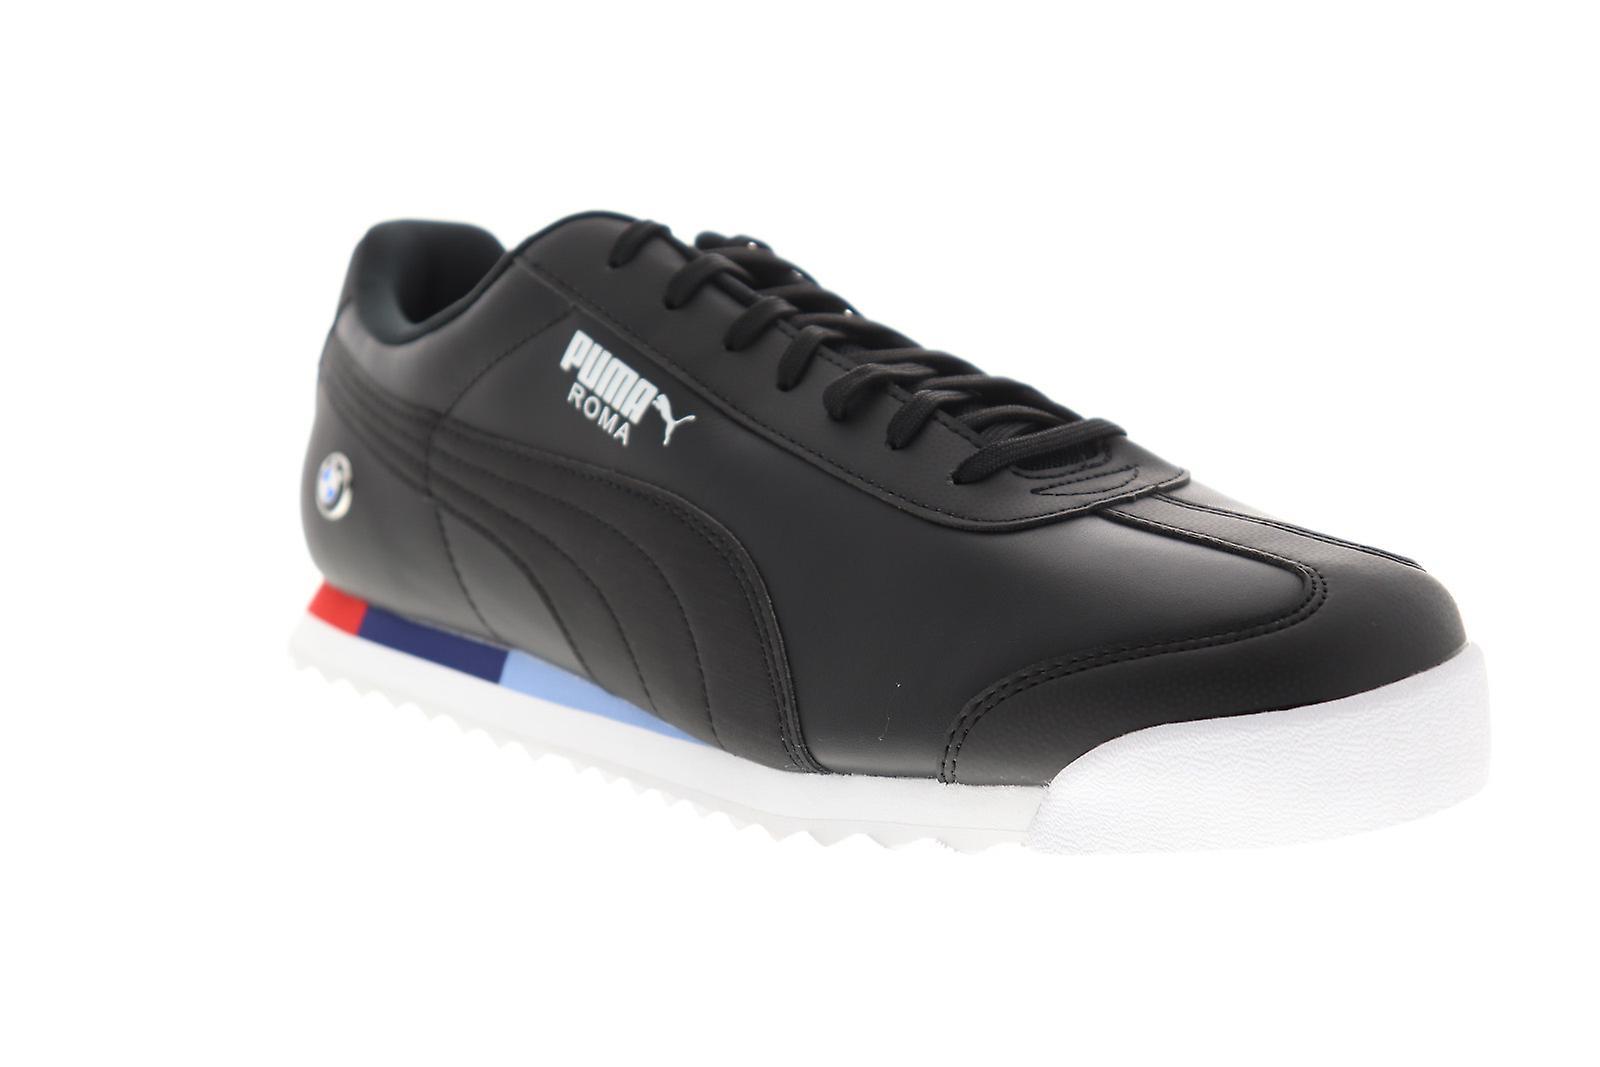 Puma BMW MMS Roma menns svart skinn lav topp joggesko sko